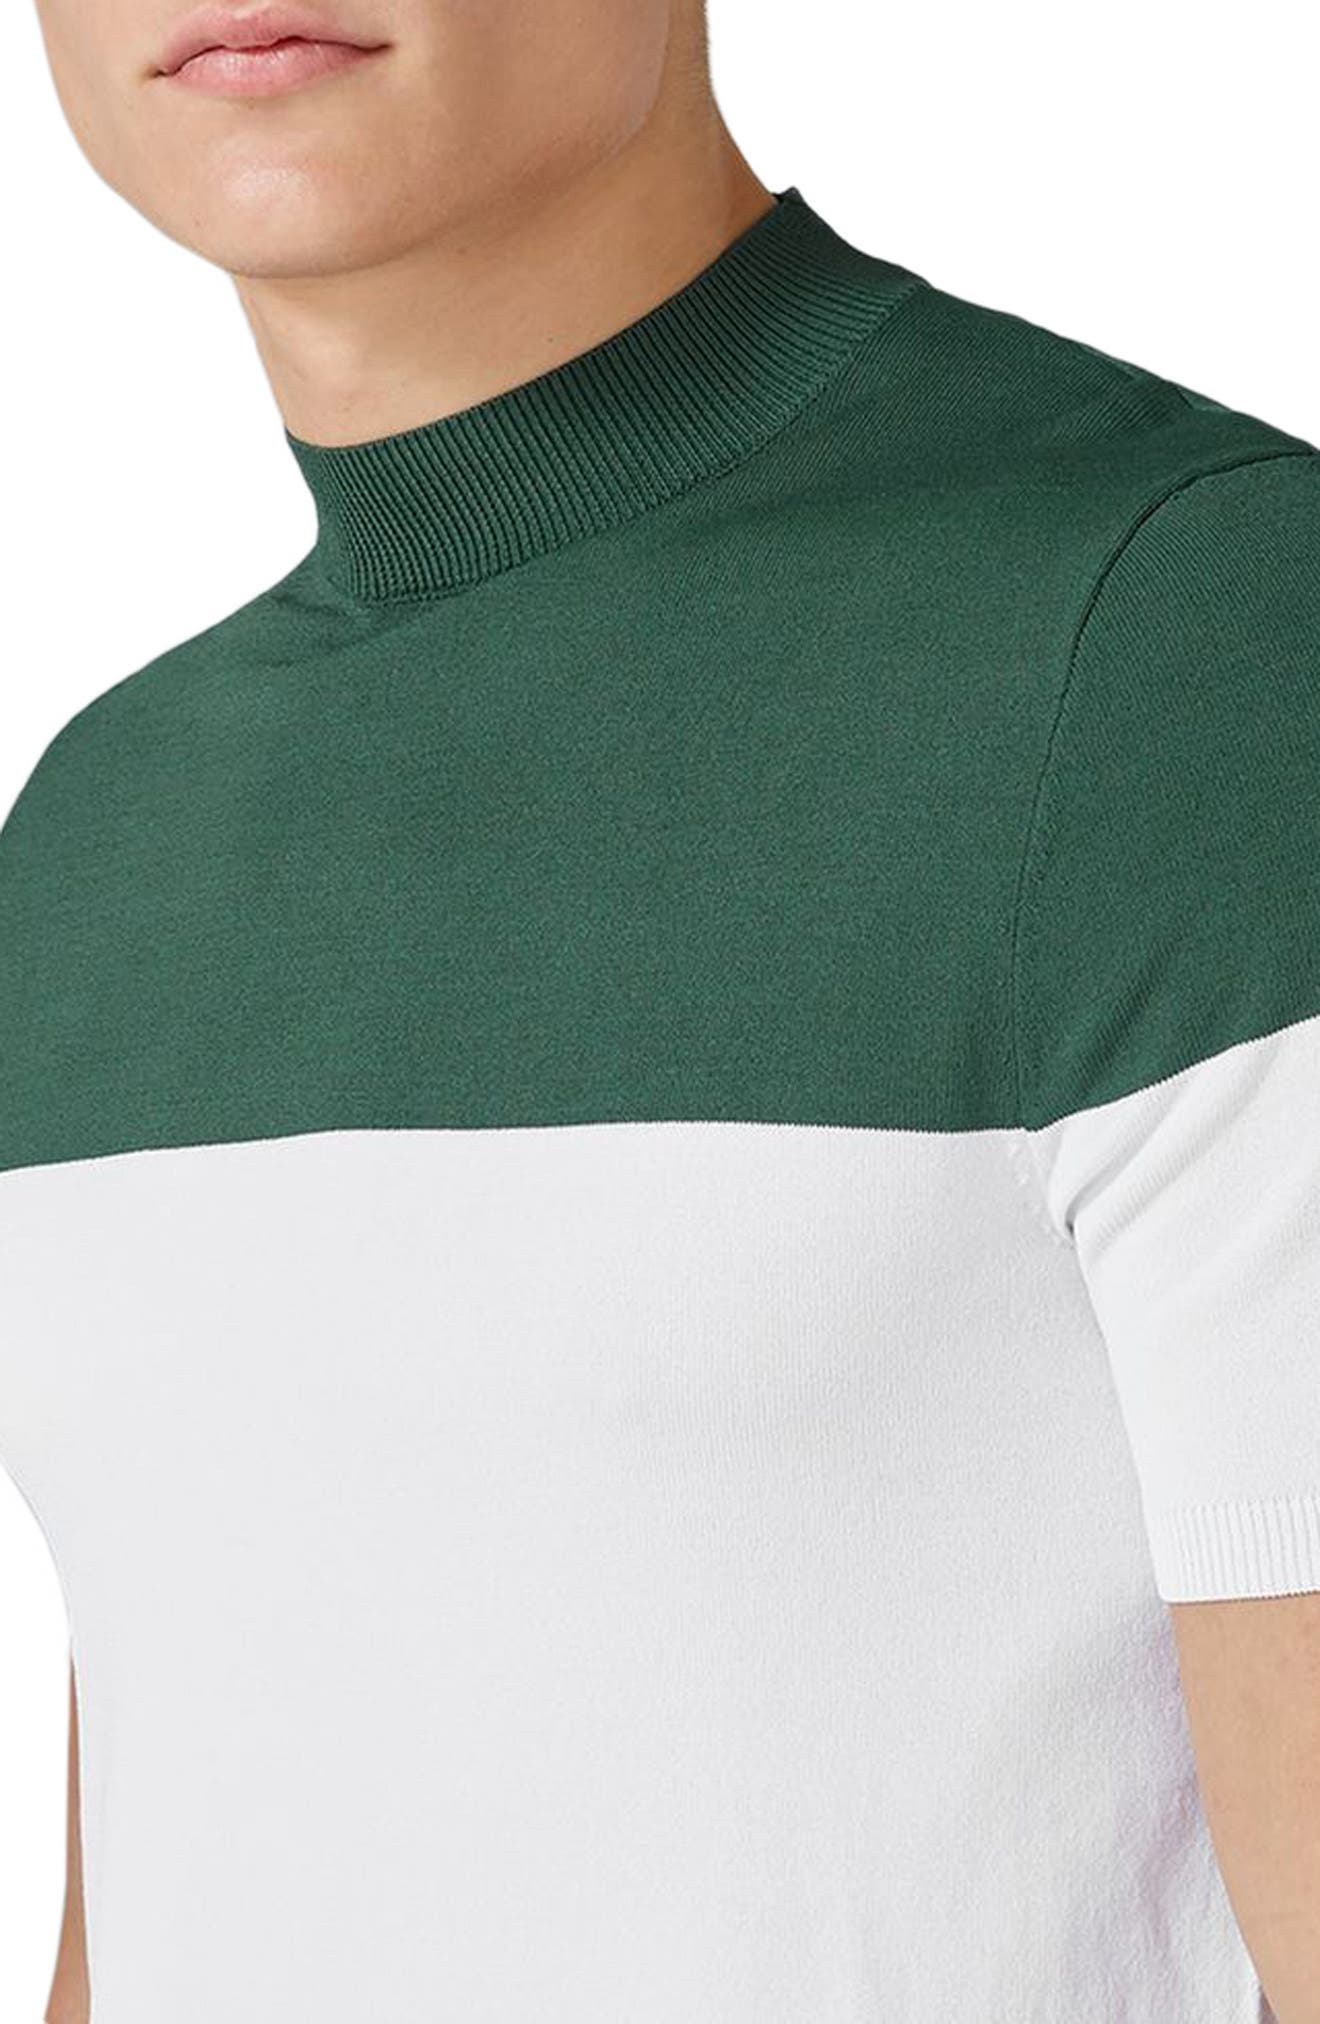 Colorblock Mock Neck Sweater,                             Alternate thumbnail 3, color,                             300